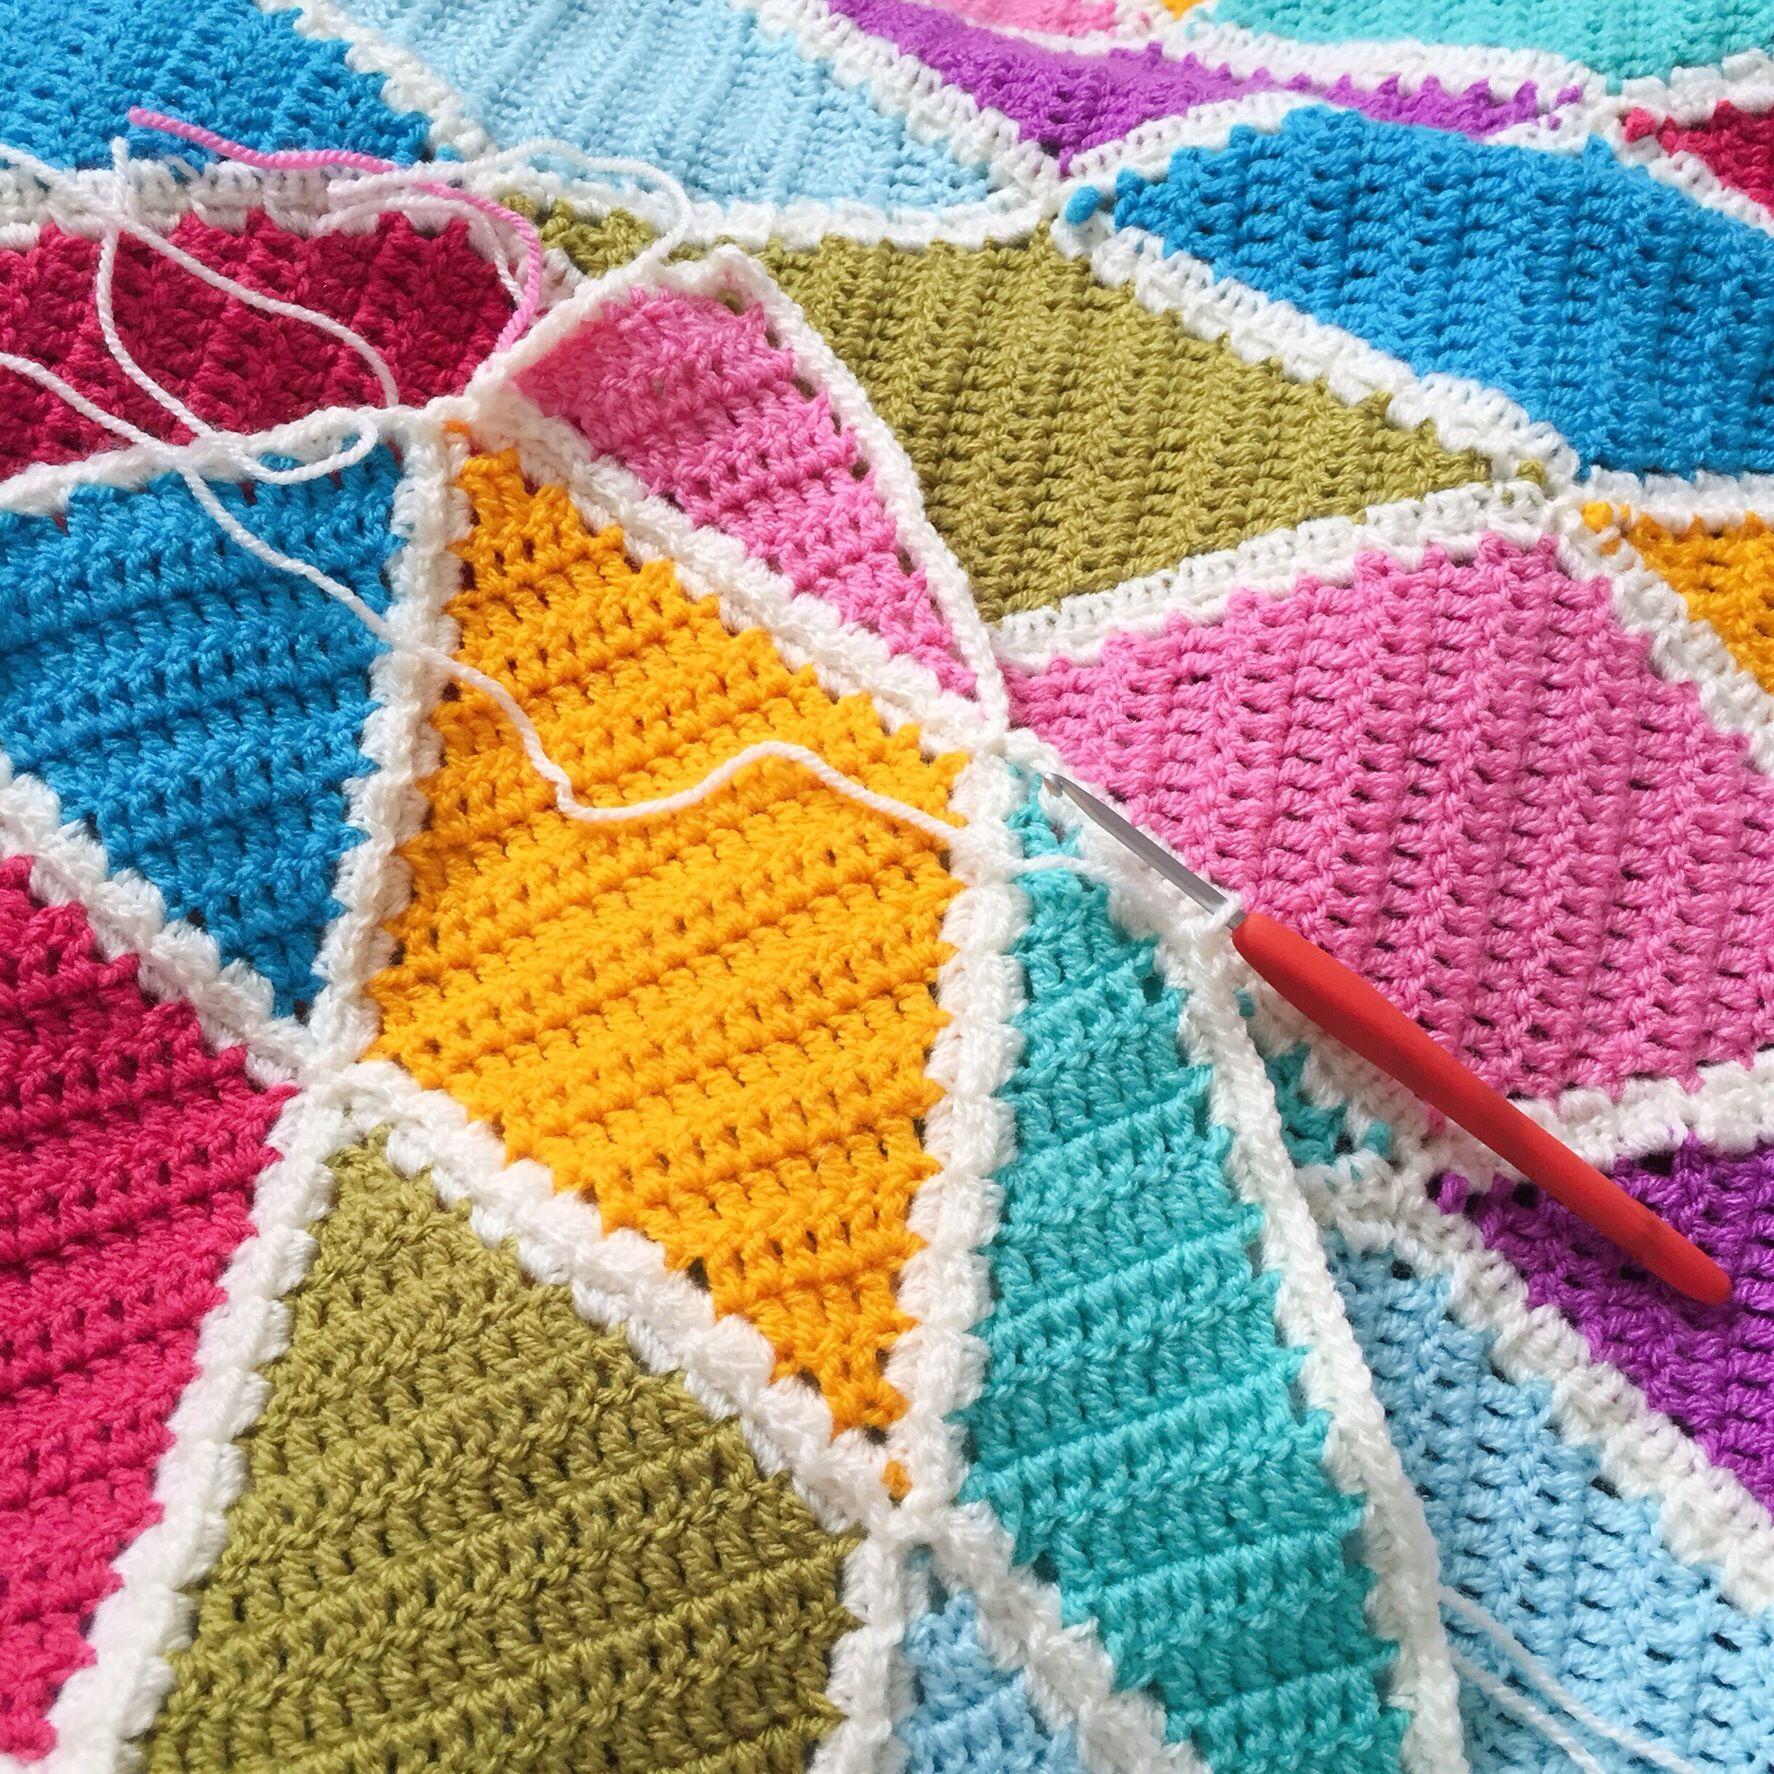 Summer Harlequin Blanket | Crochet patterns, Crochet ...